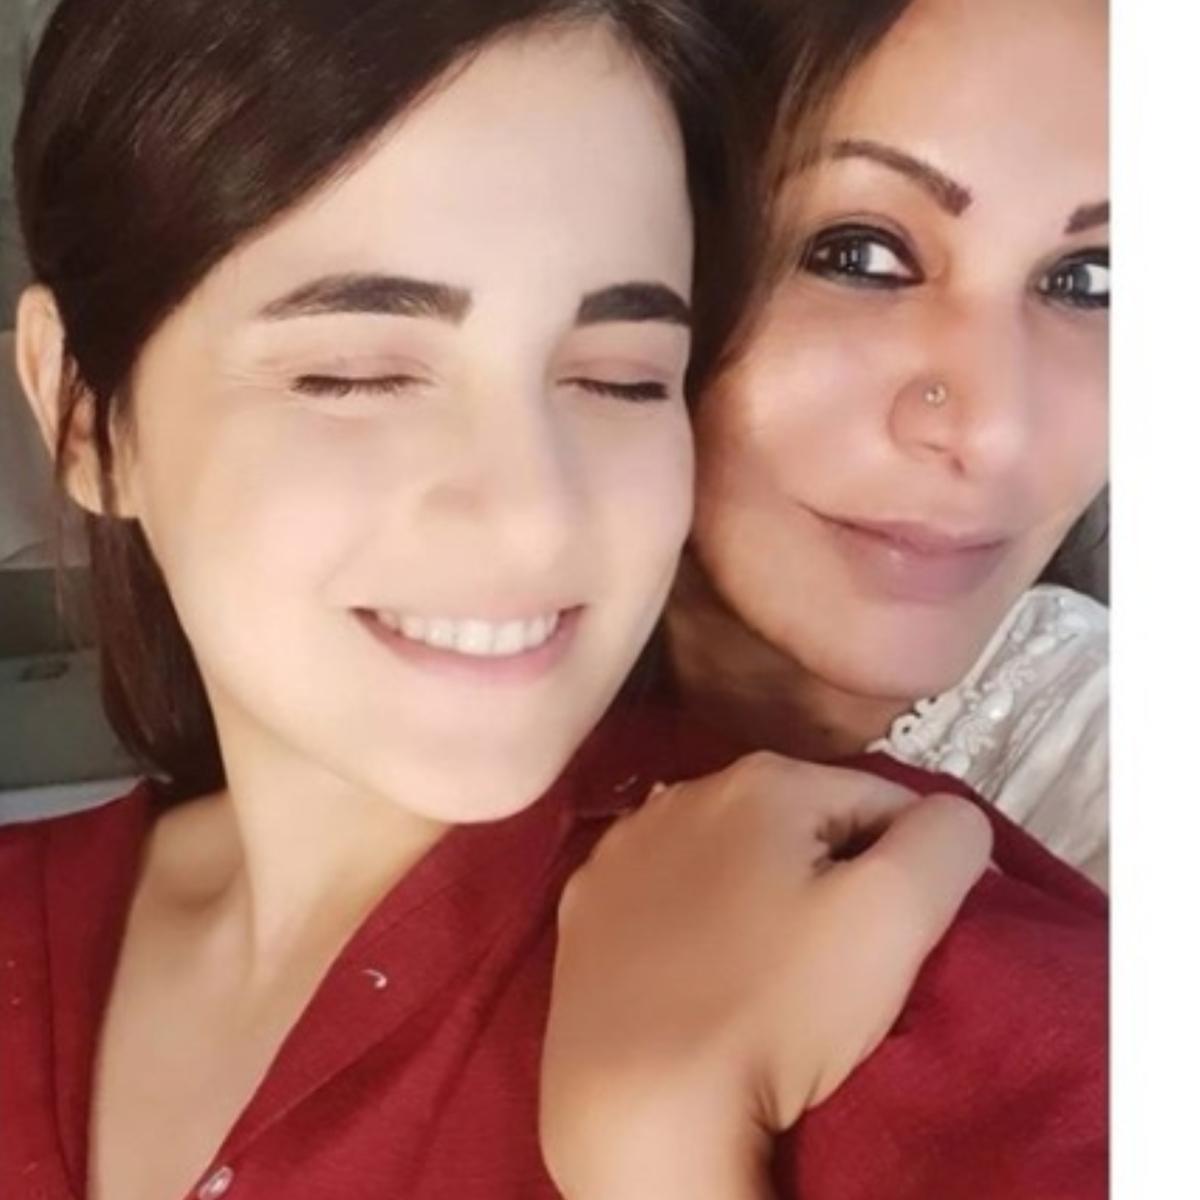 Radhika Madan reunites with her mother after 14 days 'vanvaas'